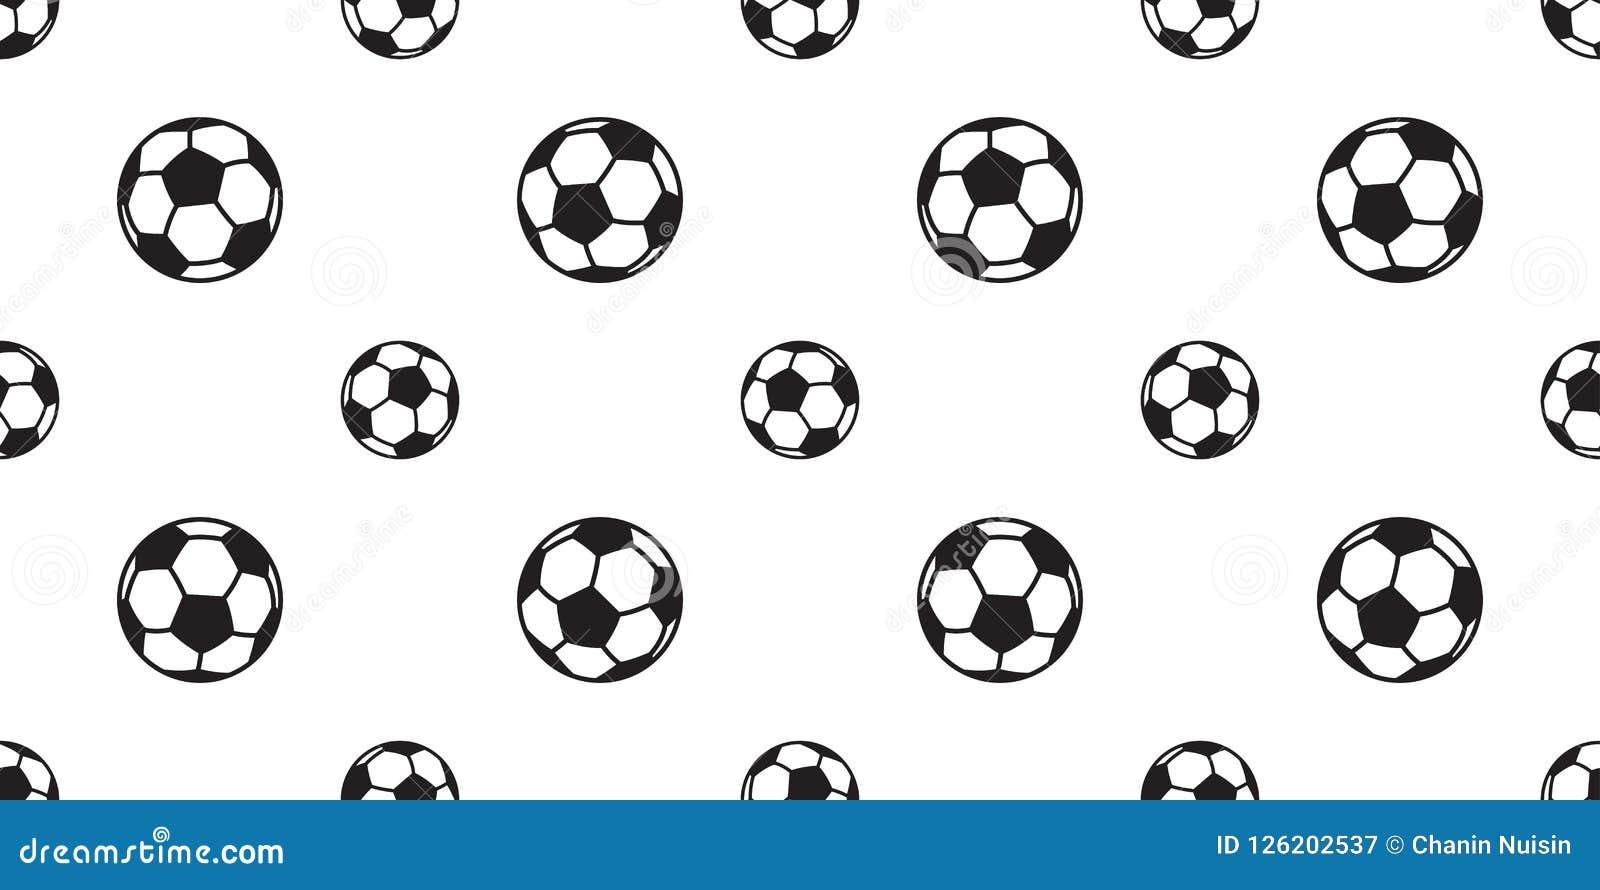 Pattern For Sport Wallpaper